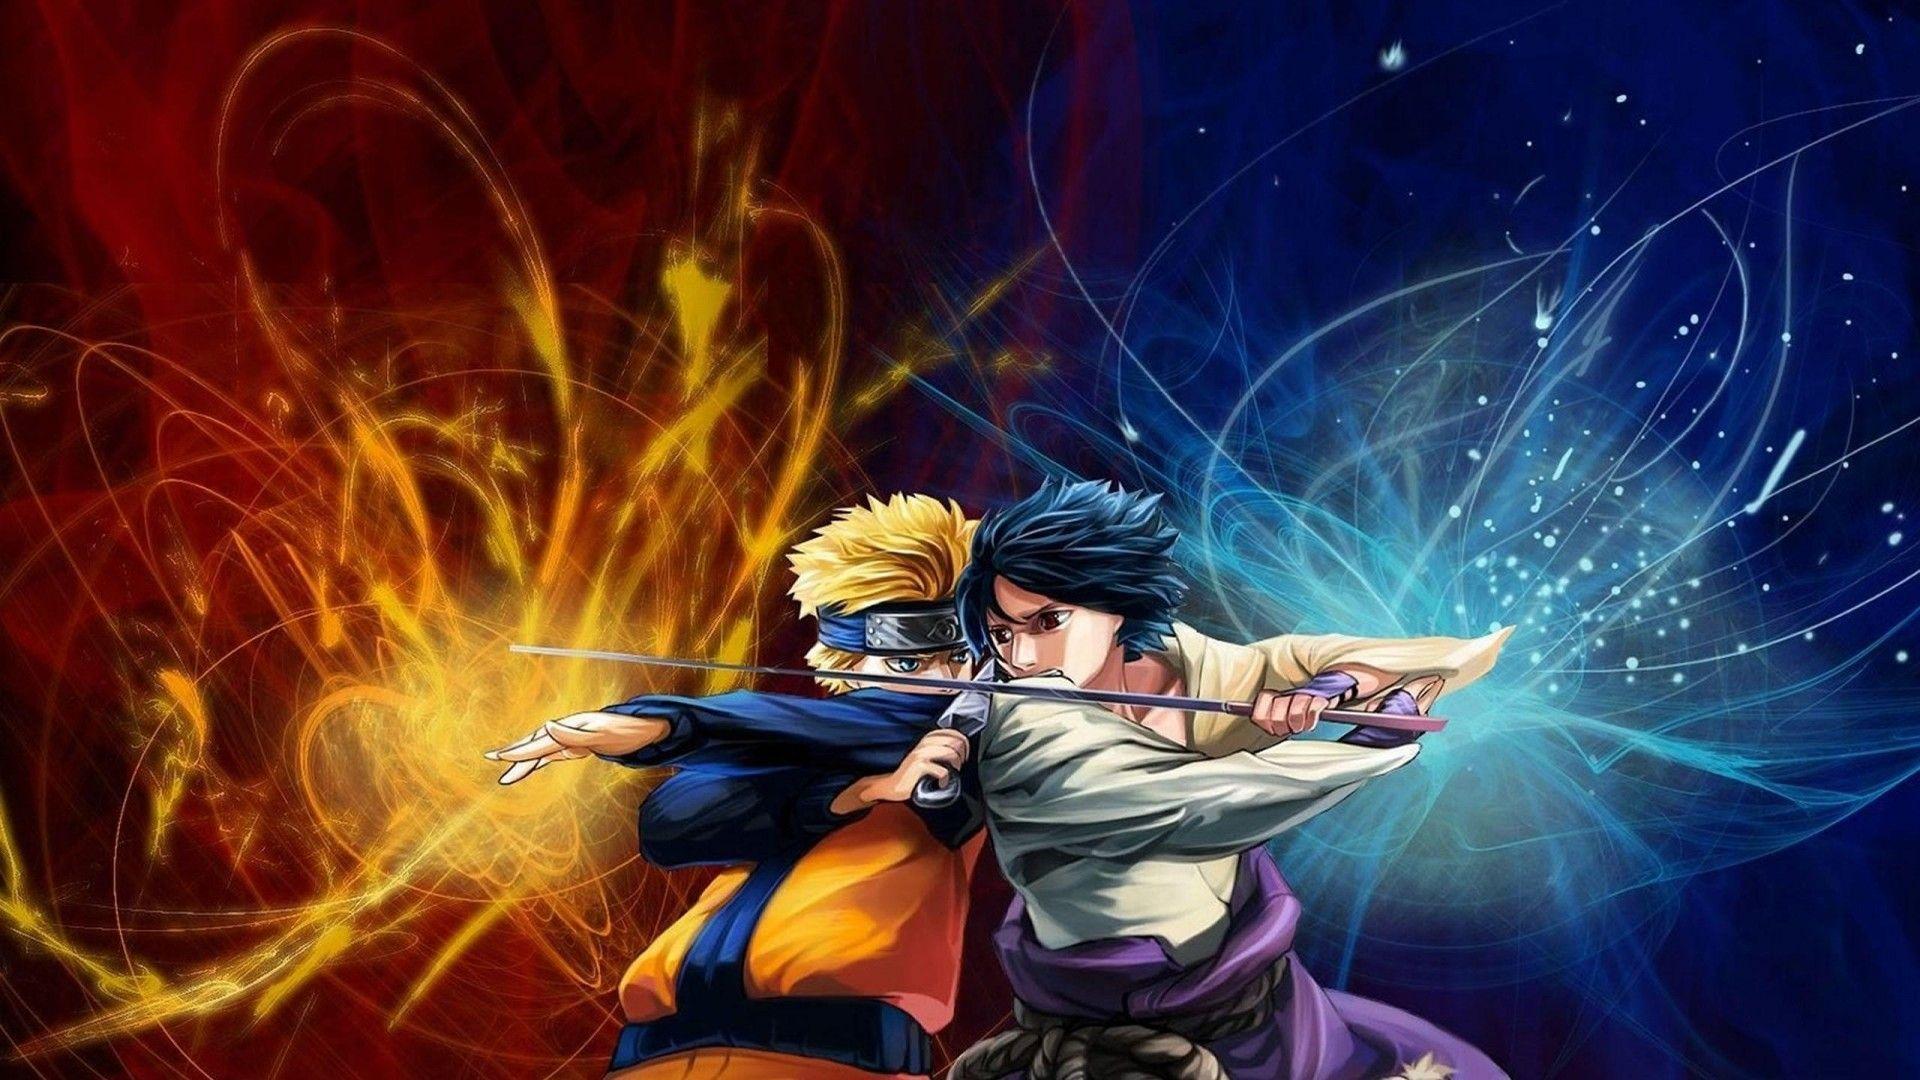 Cool Naruto Wallpapers HD 1920x1080